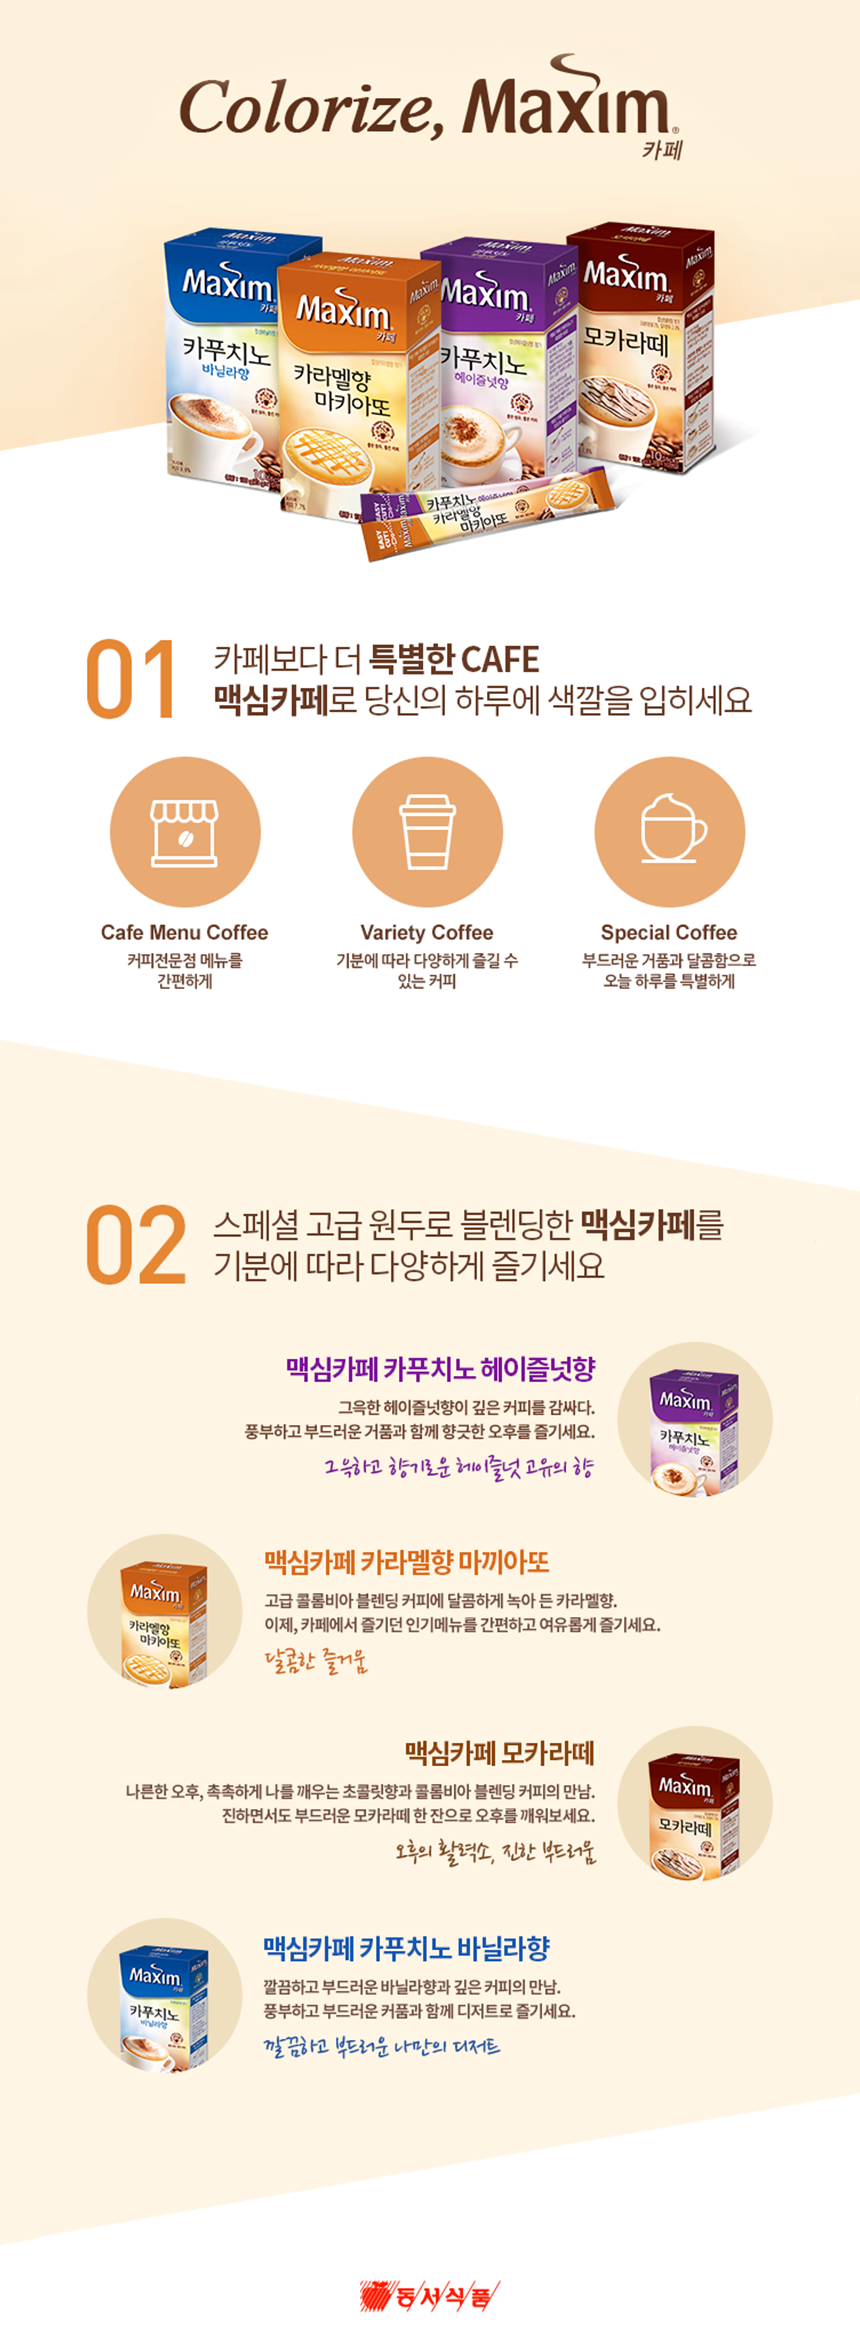 [ DongSuh ] Maxim Cafe Cappuccino Vanilla 10T